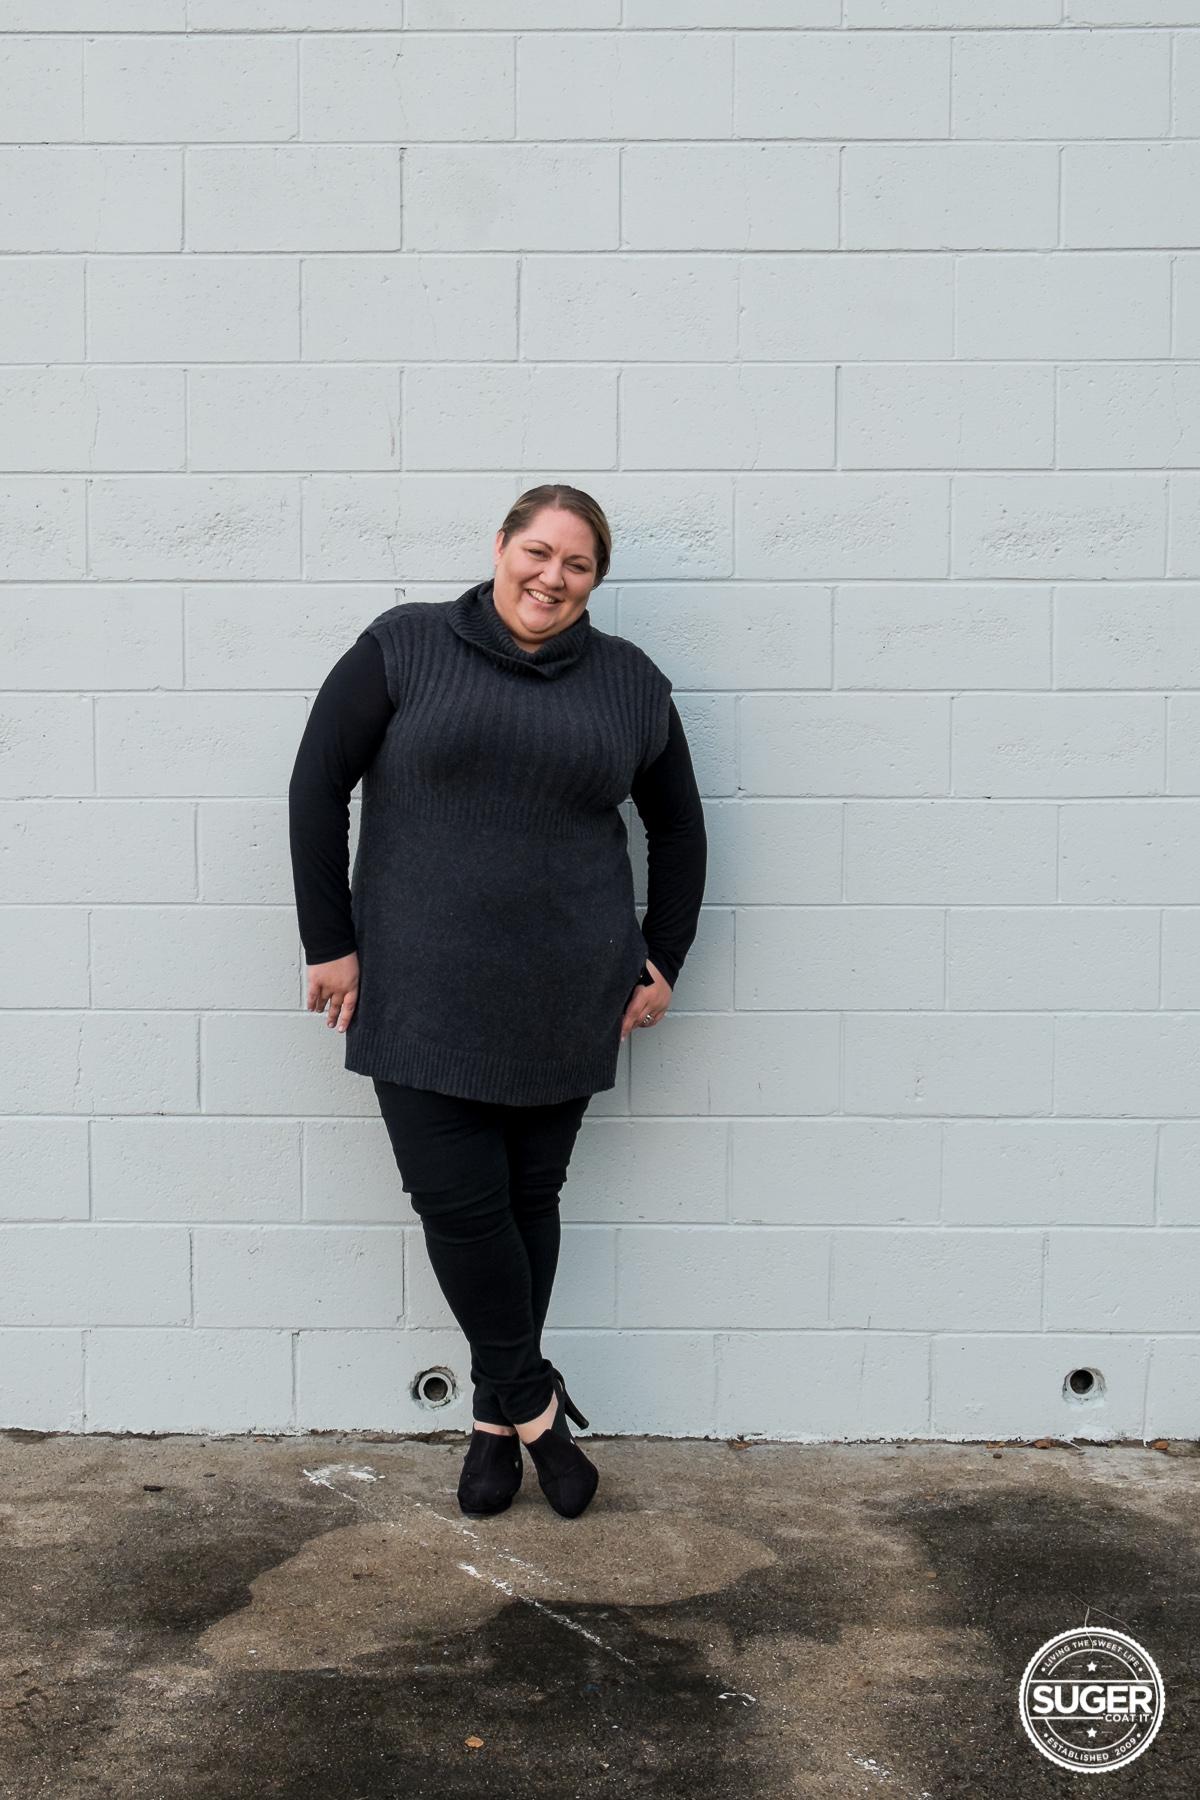 plus size jeans outfits australian plus fashion blogger harlow australia-7